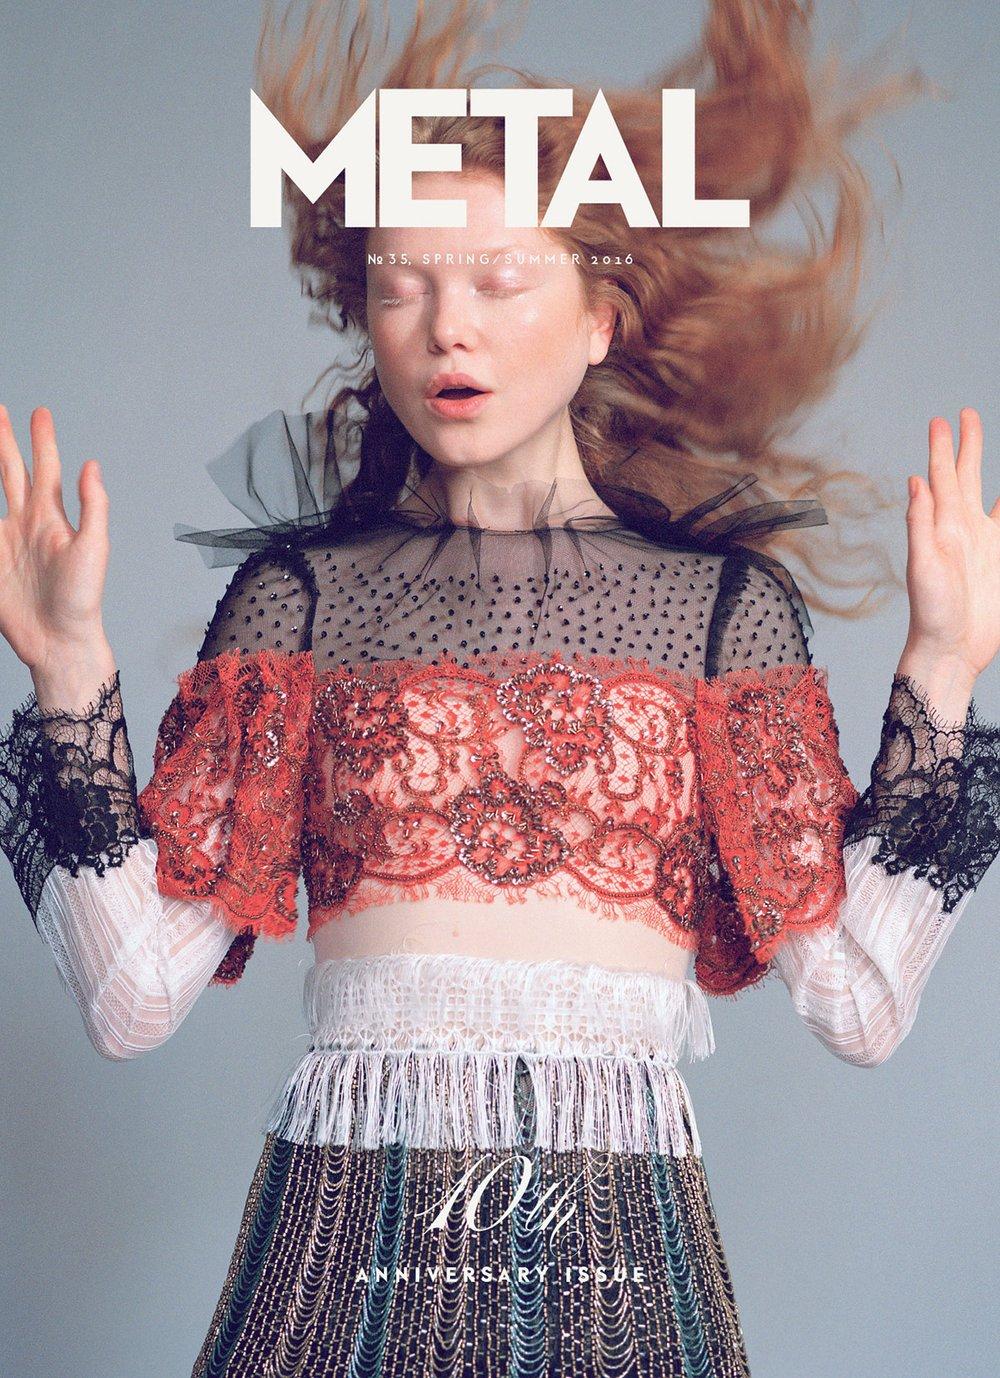 COVER 2 - Varya Shutova (Muse) wearing Rodarte by Maurizio Bavutti